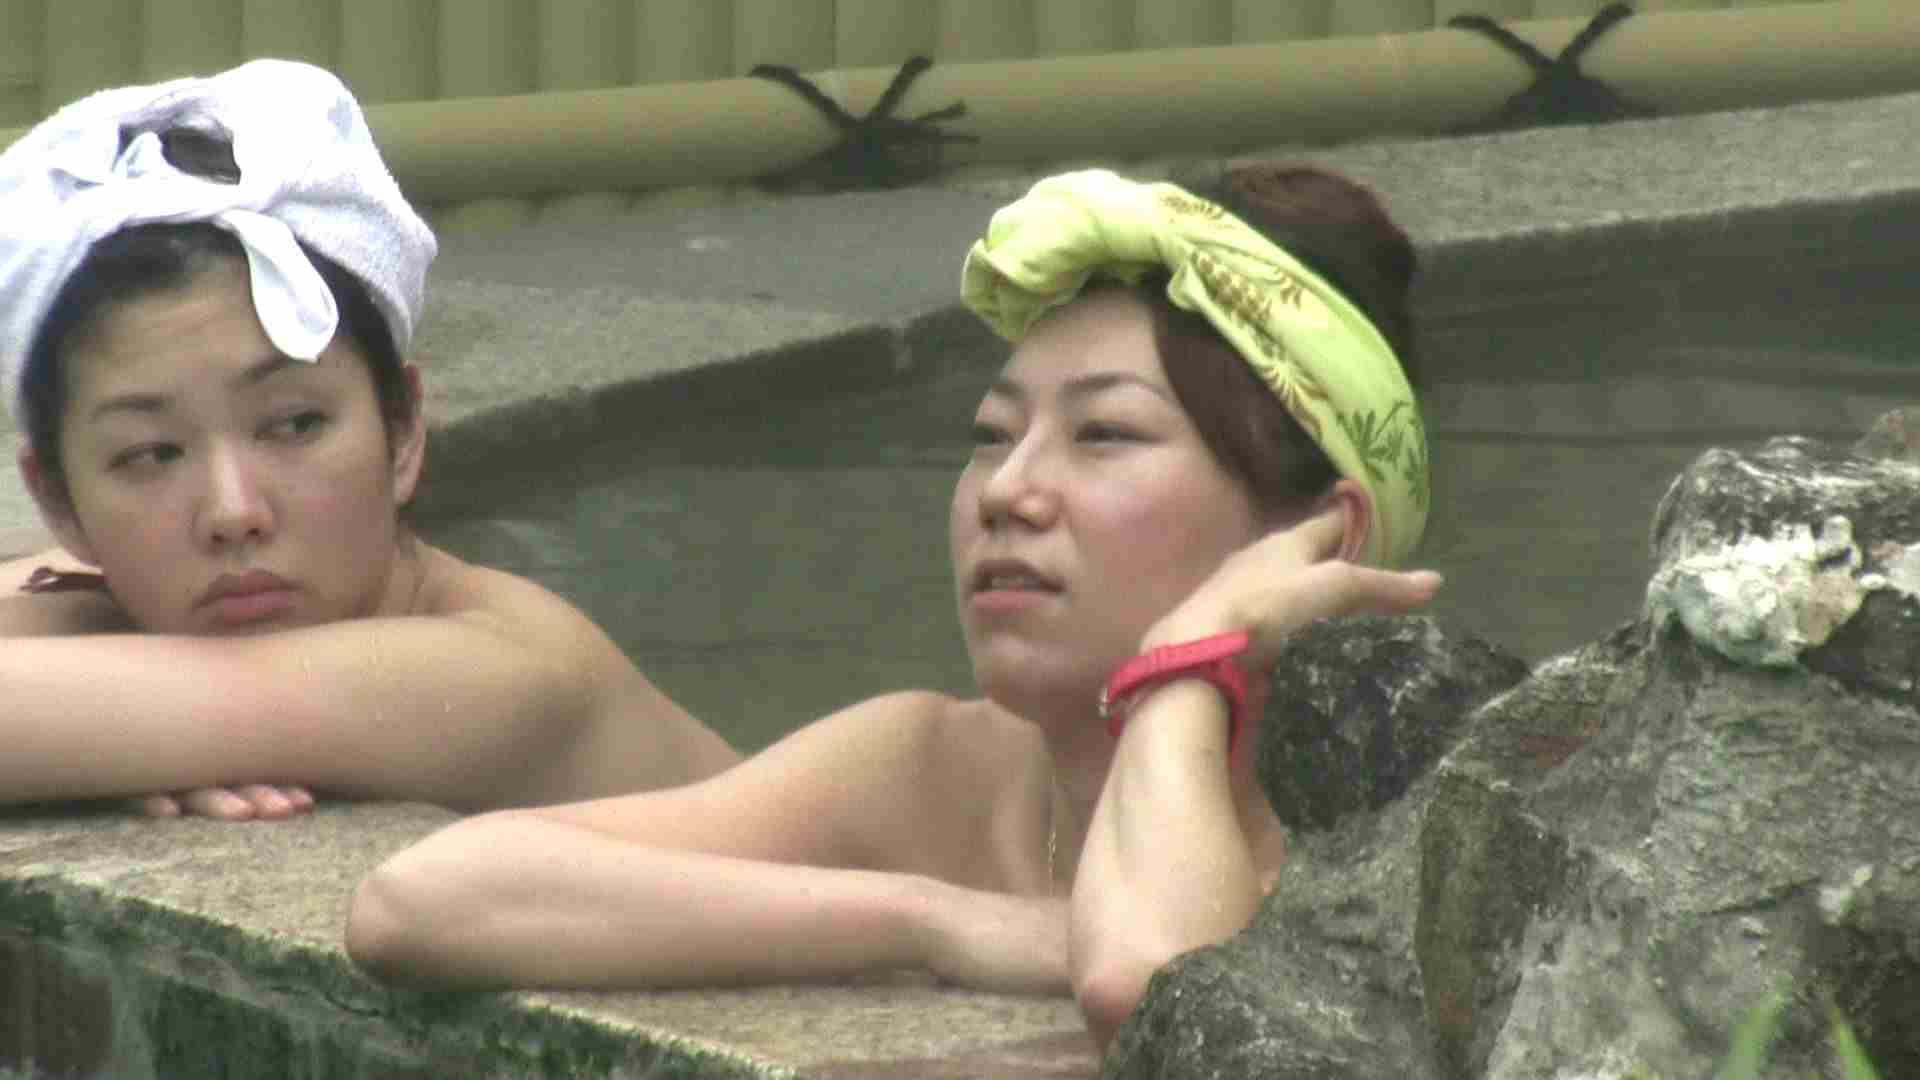 Aquaな露天風呂Vol.192 露天風呂突入 | 盗撮師作品  101pic 46